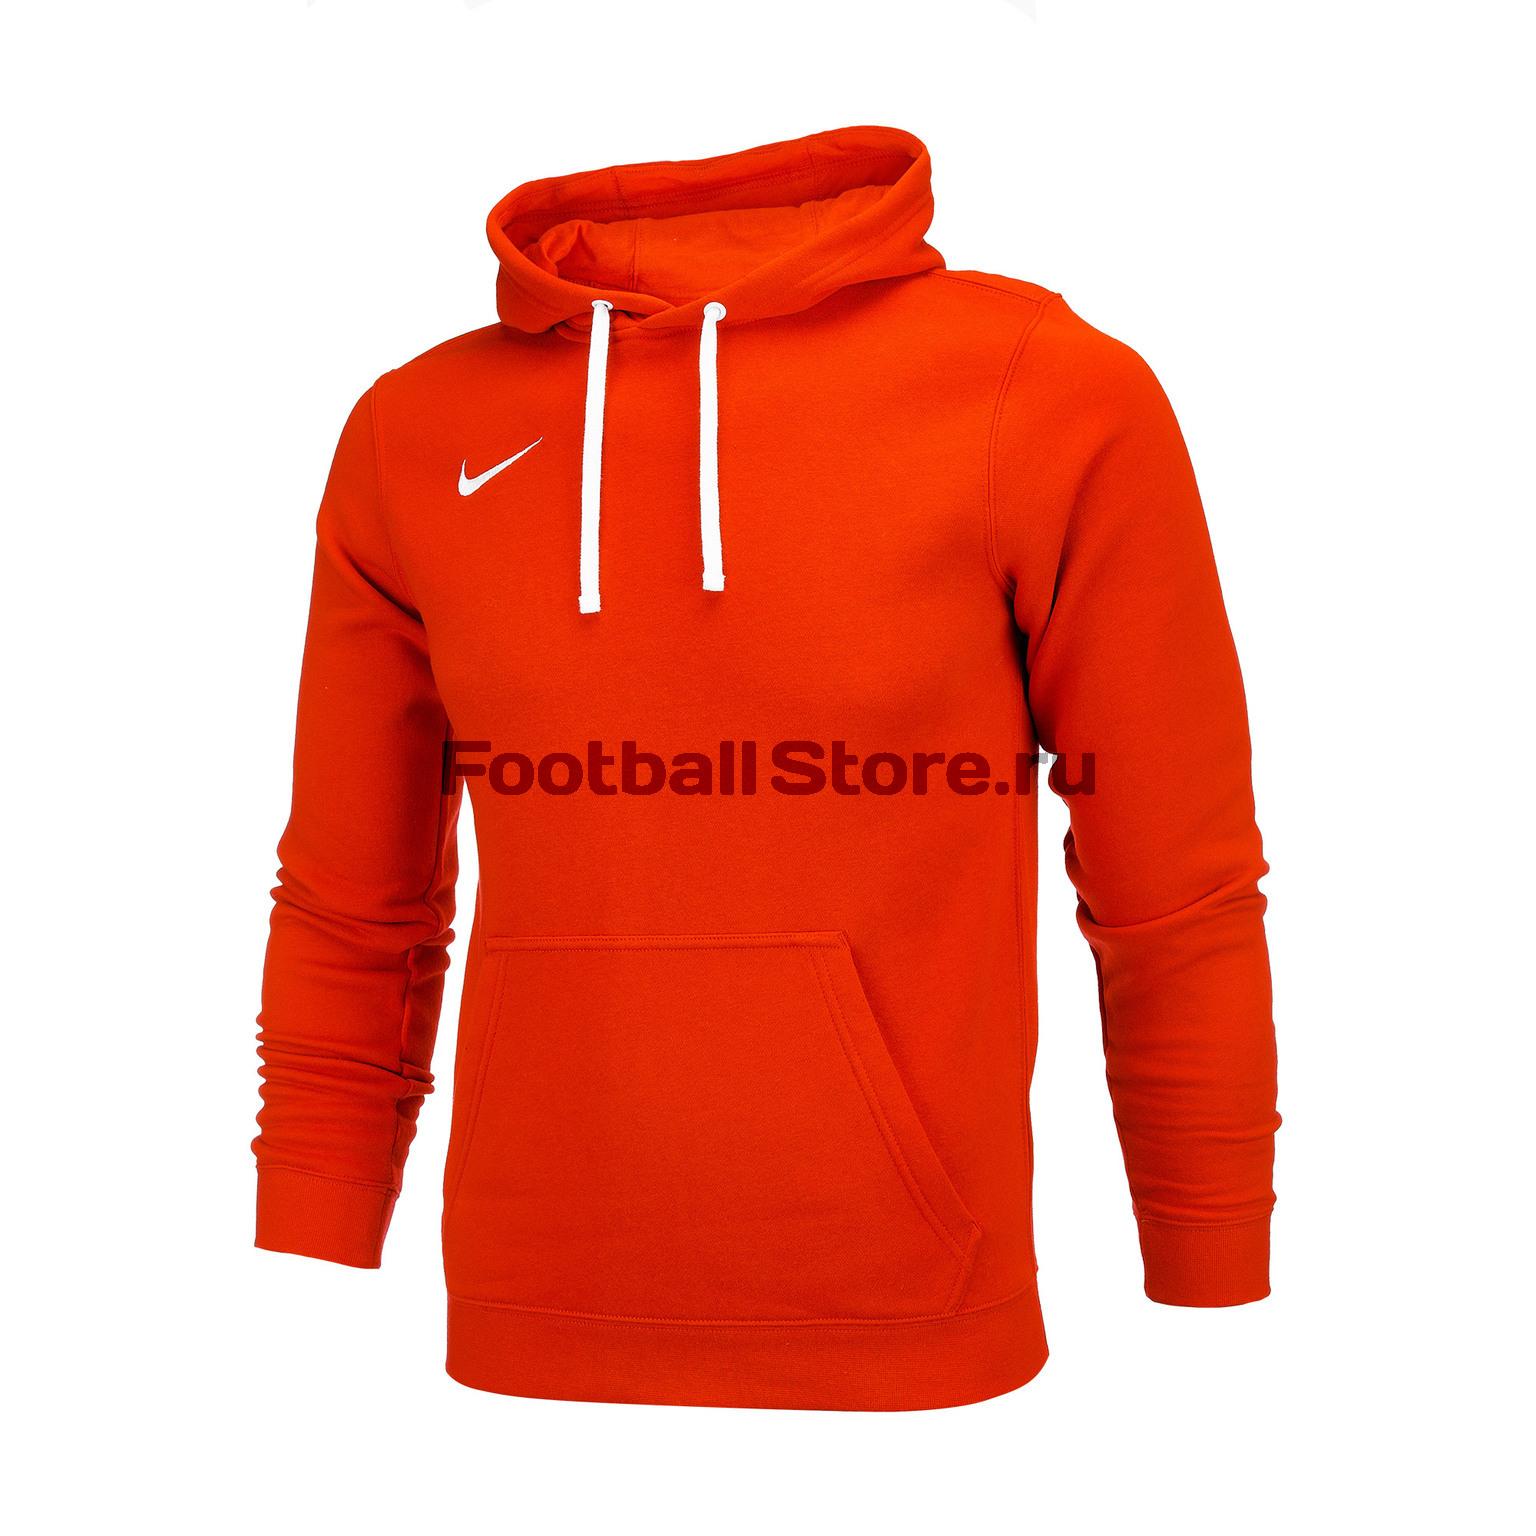 Толстовка Nike Hoodie Po Flc Club19 AR3239-657 встраиваемый светильник maytoni dl009 2 01 ch